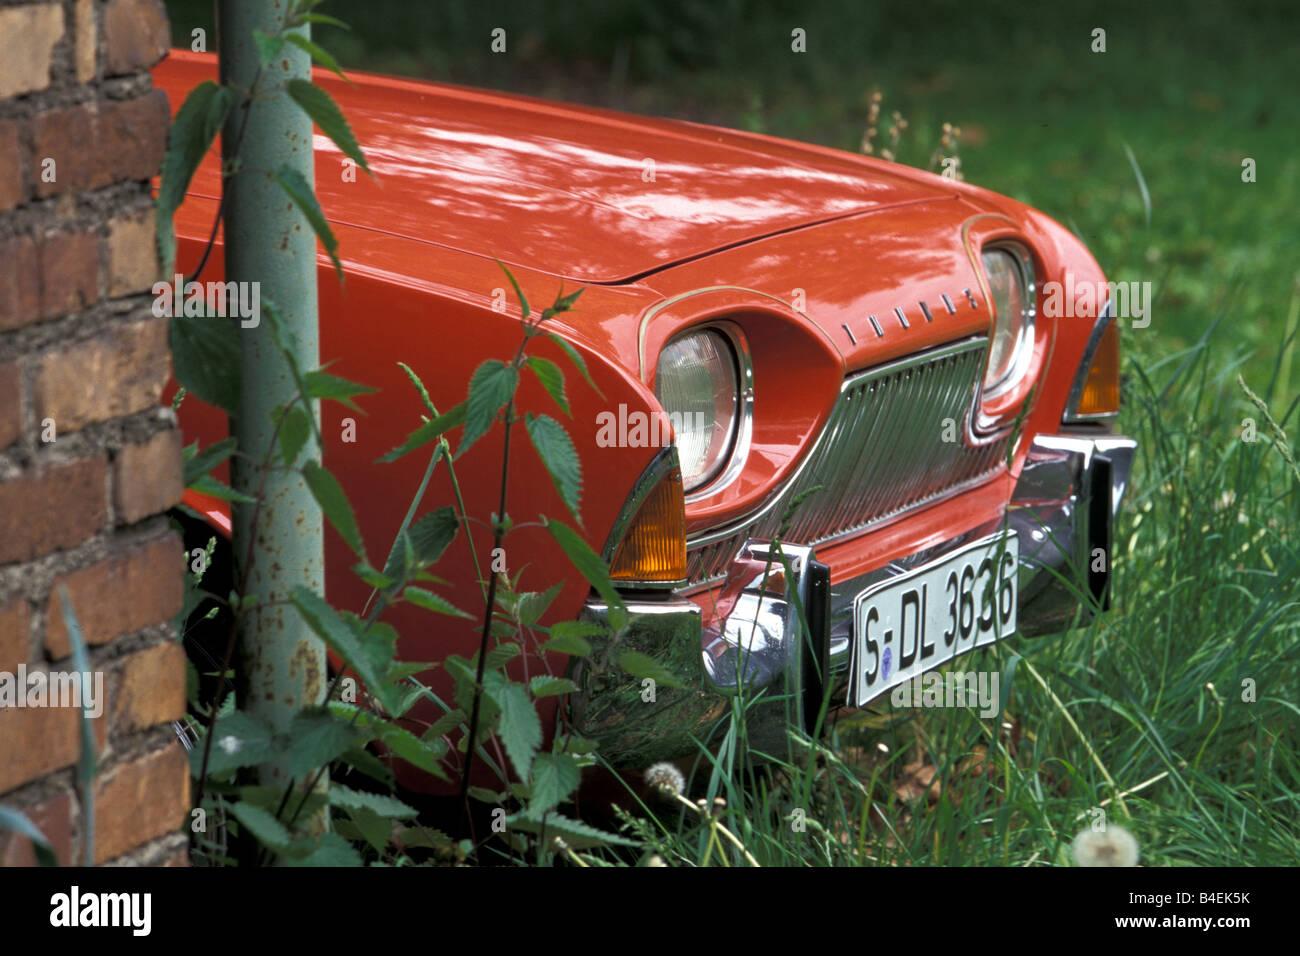 car ford taunus 17m p3 bath tub red white model. Black Bedroom Furniture Sets. Home Design Ideas